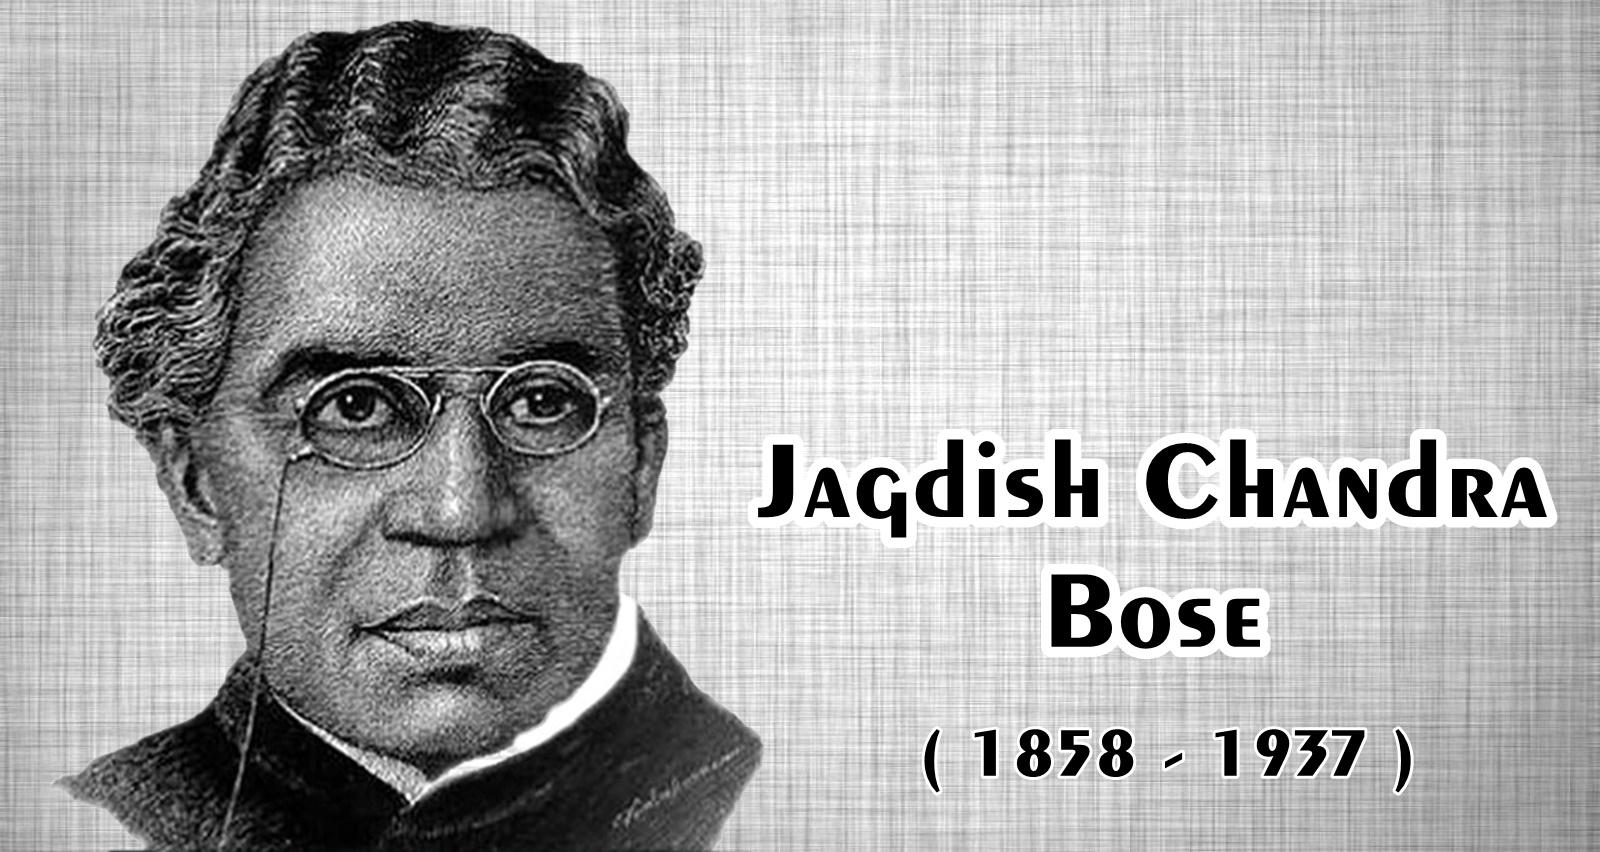 jagdish chandra bose essay writer